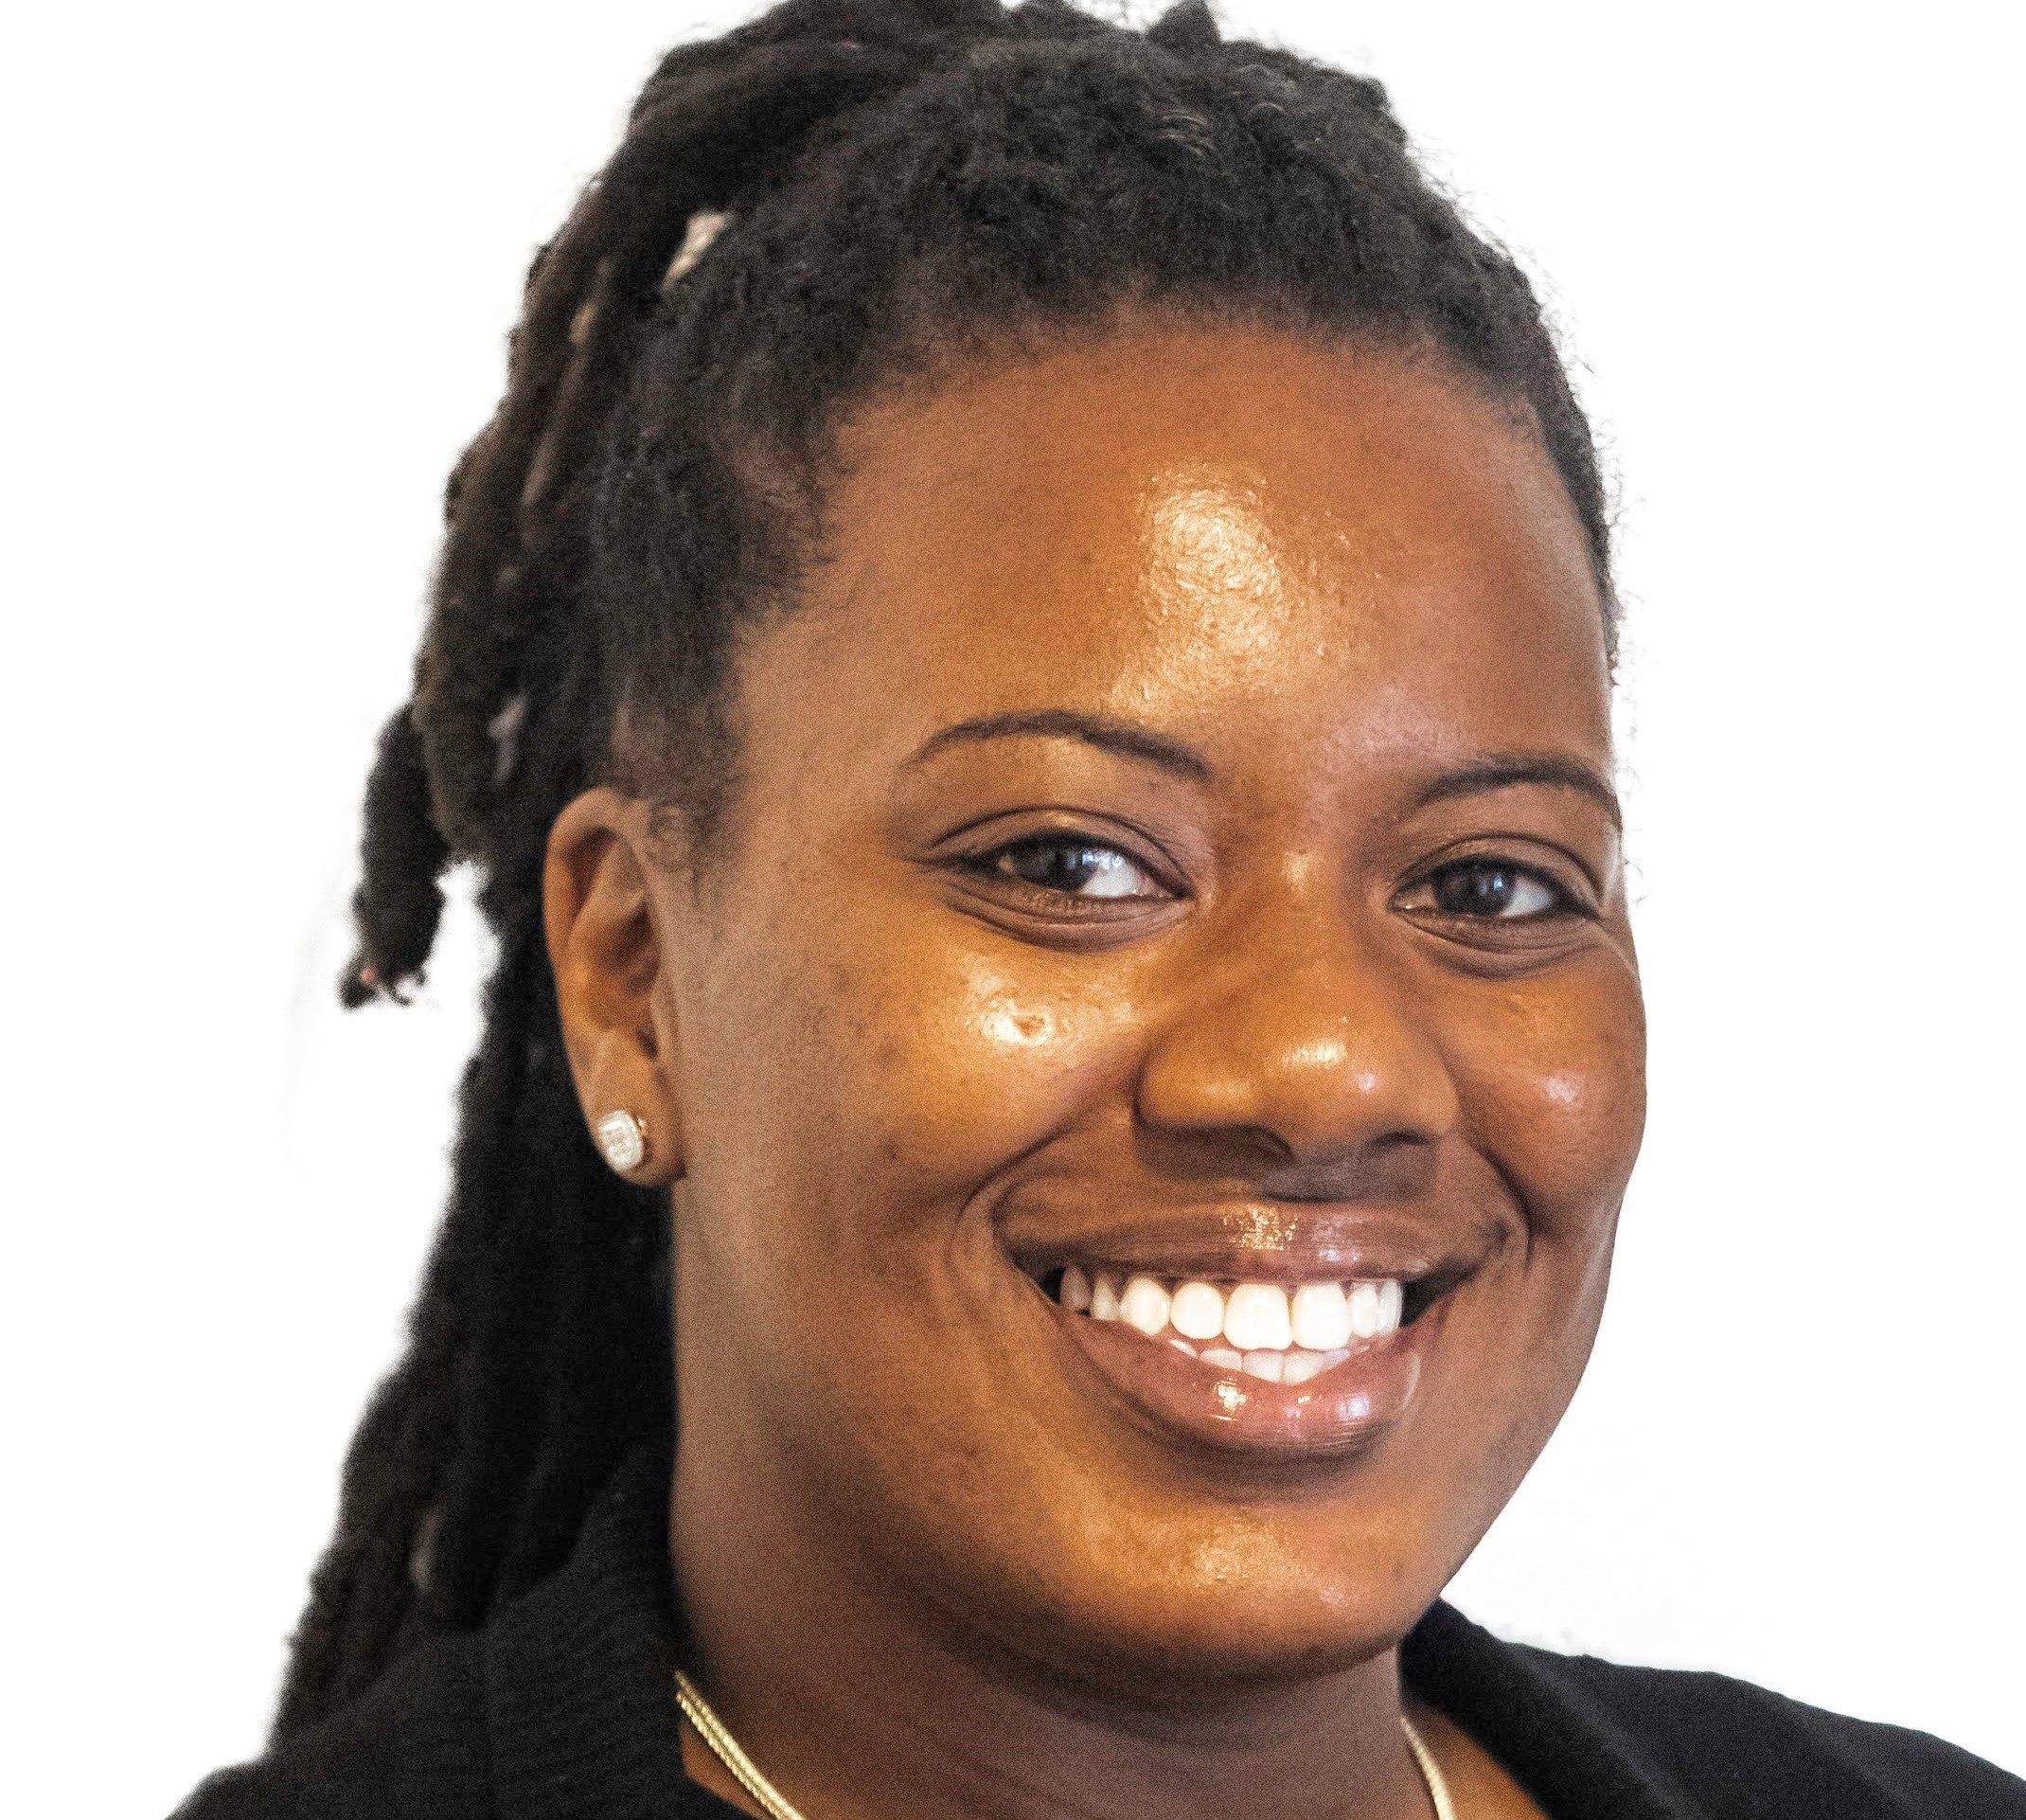 <strong>Katrina Sheffield, Owner/Educator</strong>